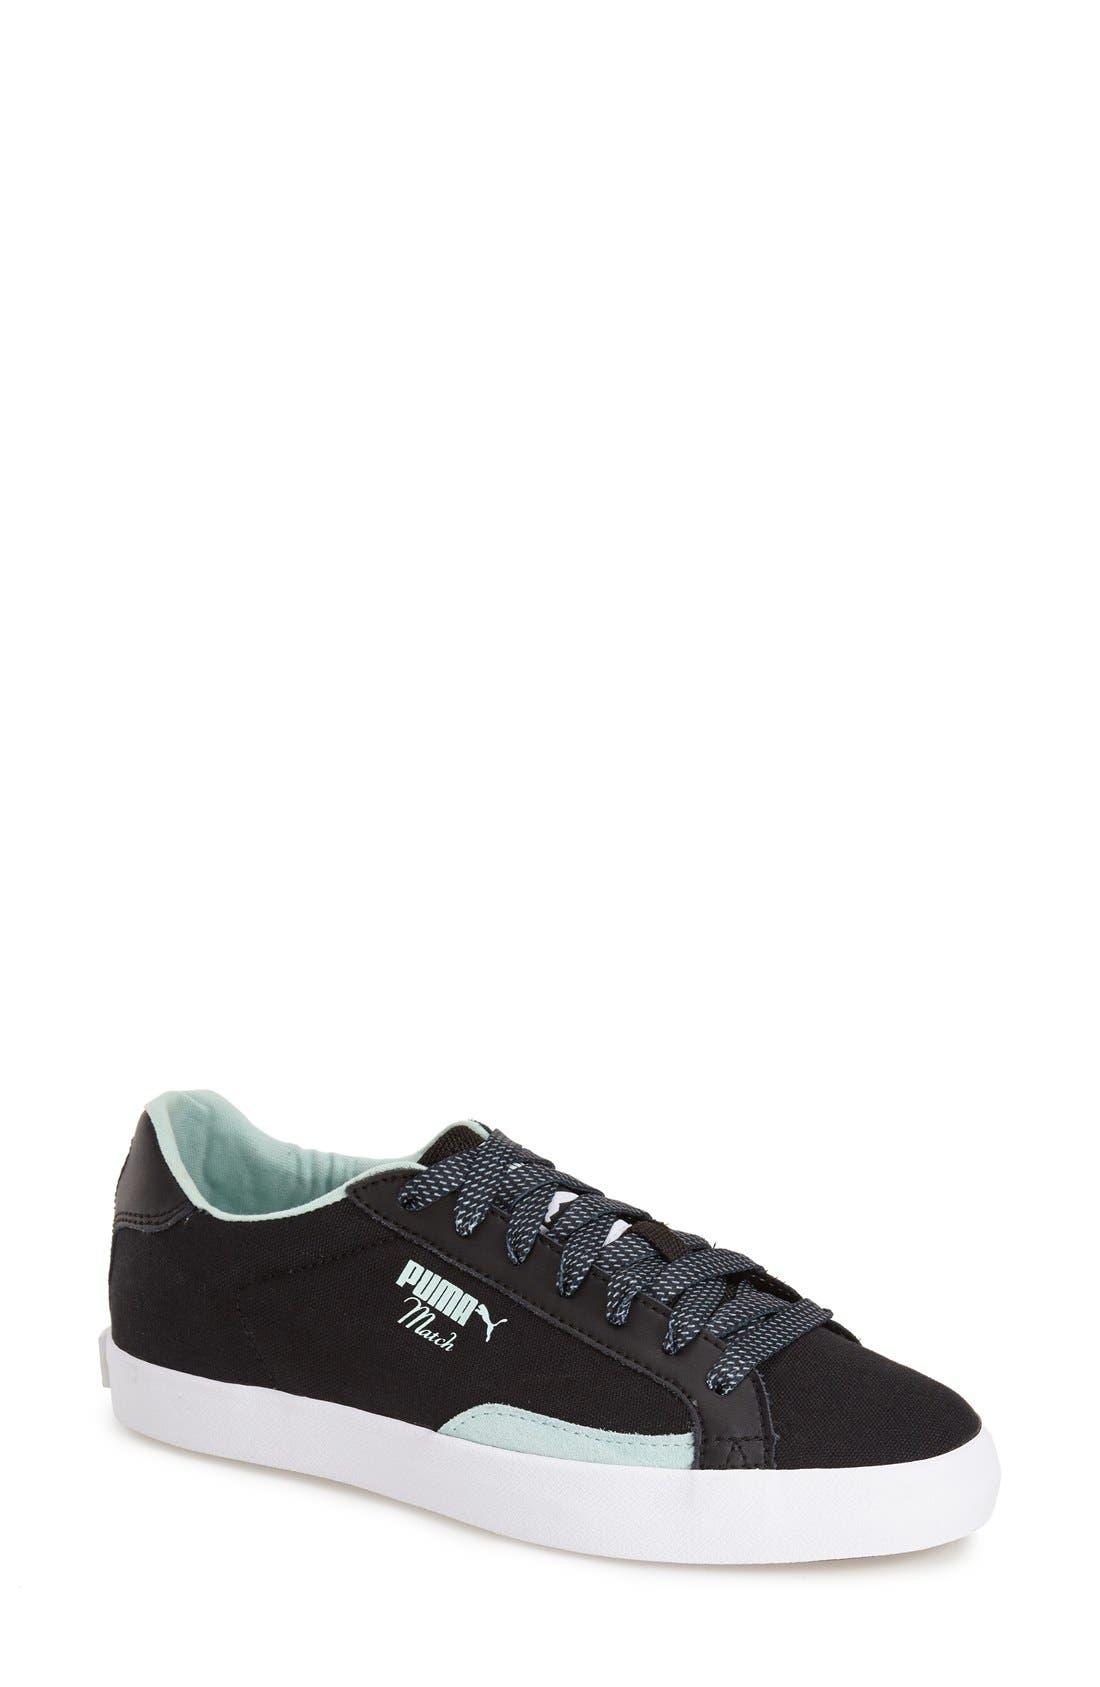 Main Image - PUMA 'Match Vulc' Sneaker (Women)